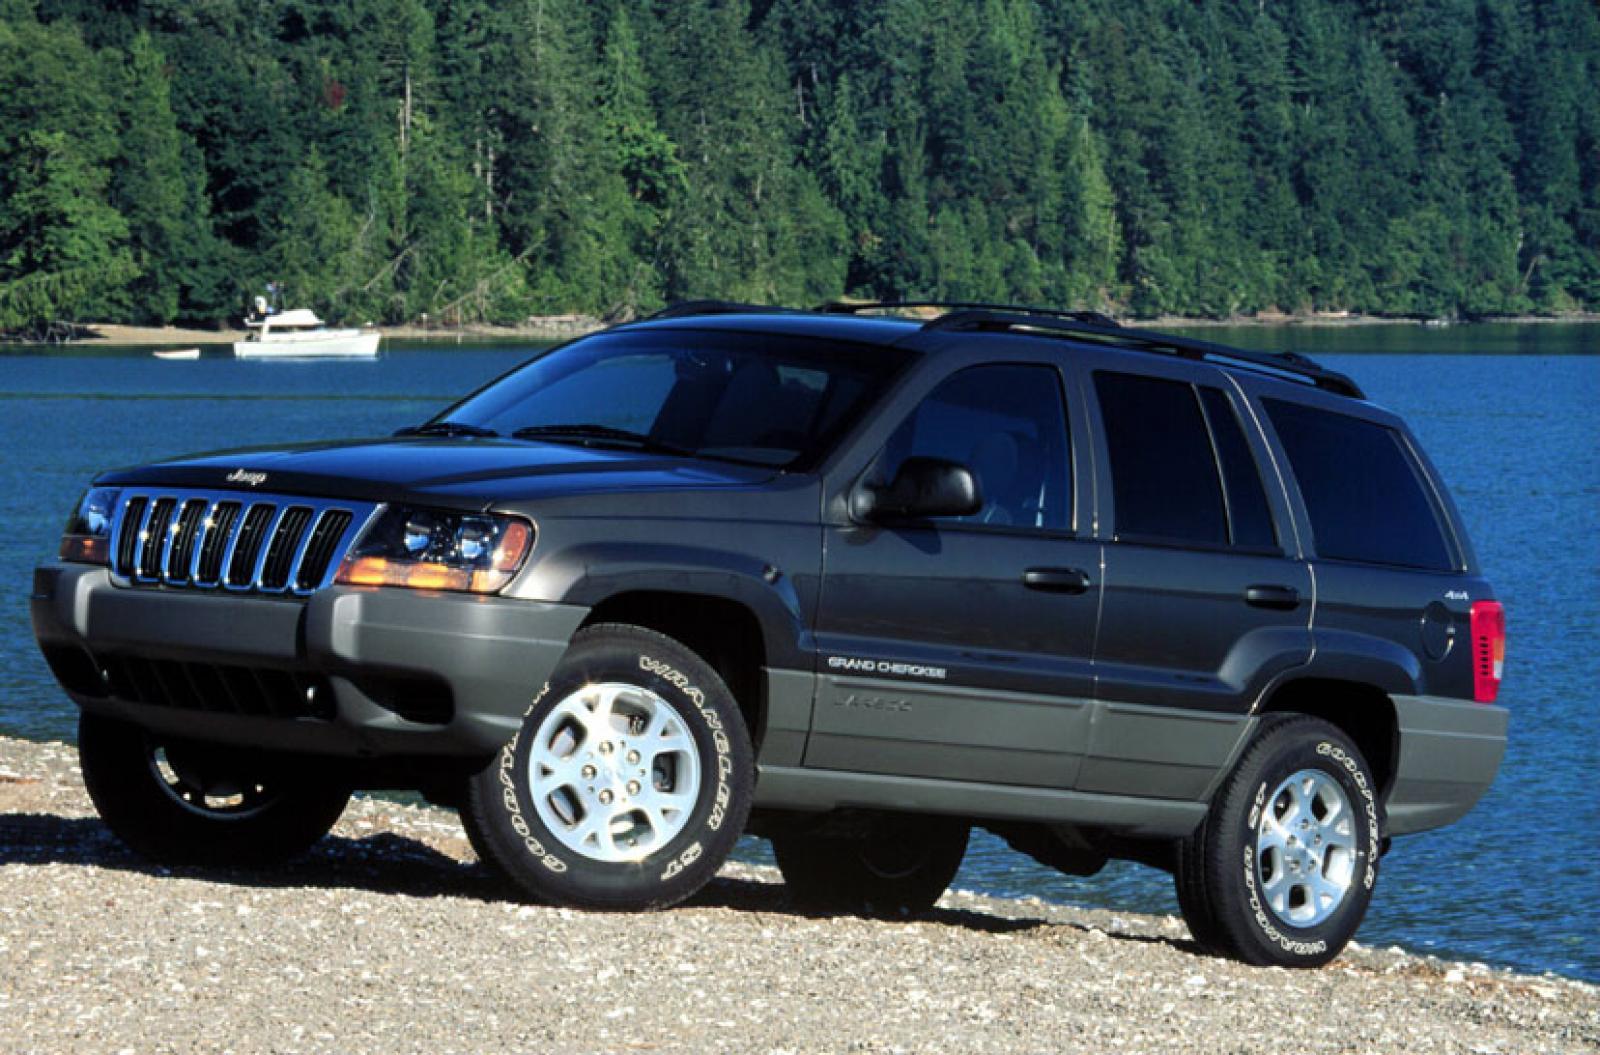 1999 Jeep Grand Cherokee #2 Jeep Grand Cherokee #2 800 1024 1280 1600  Origin ...